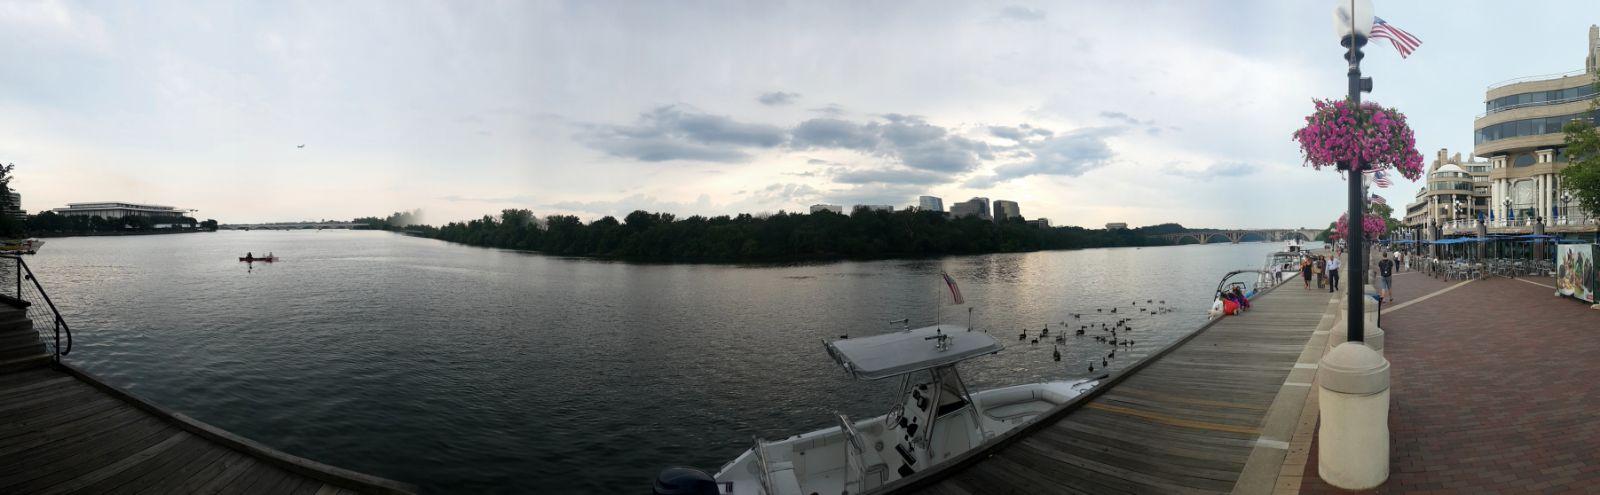 GRID Potomac River pano.jpeg